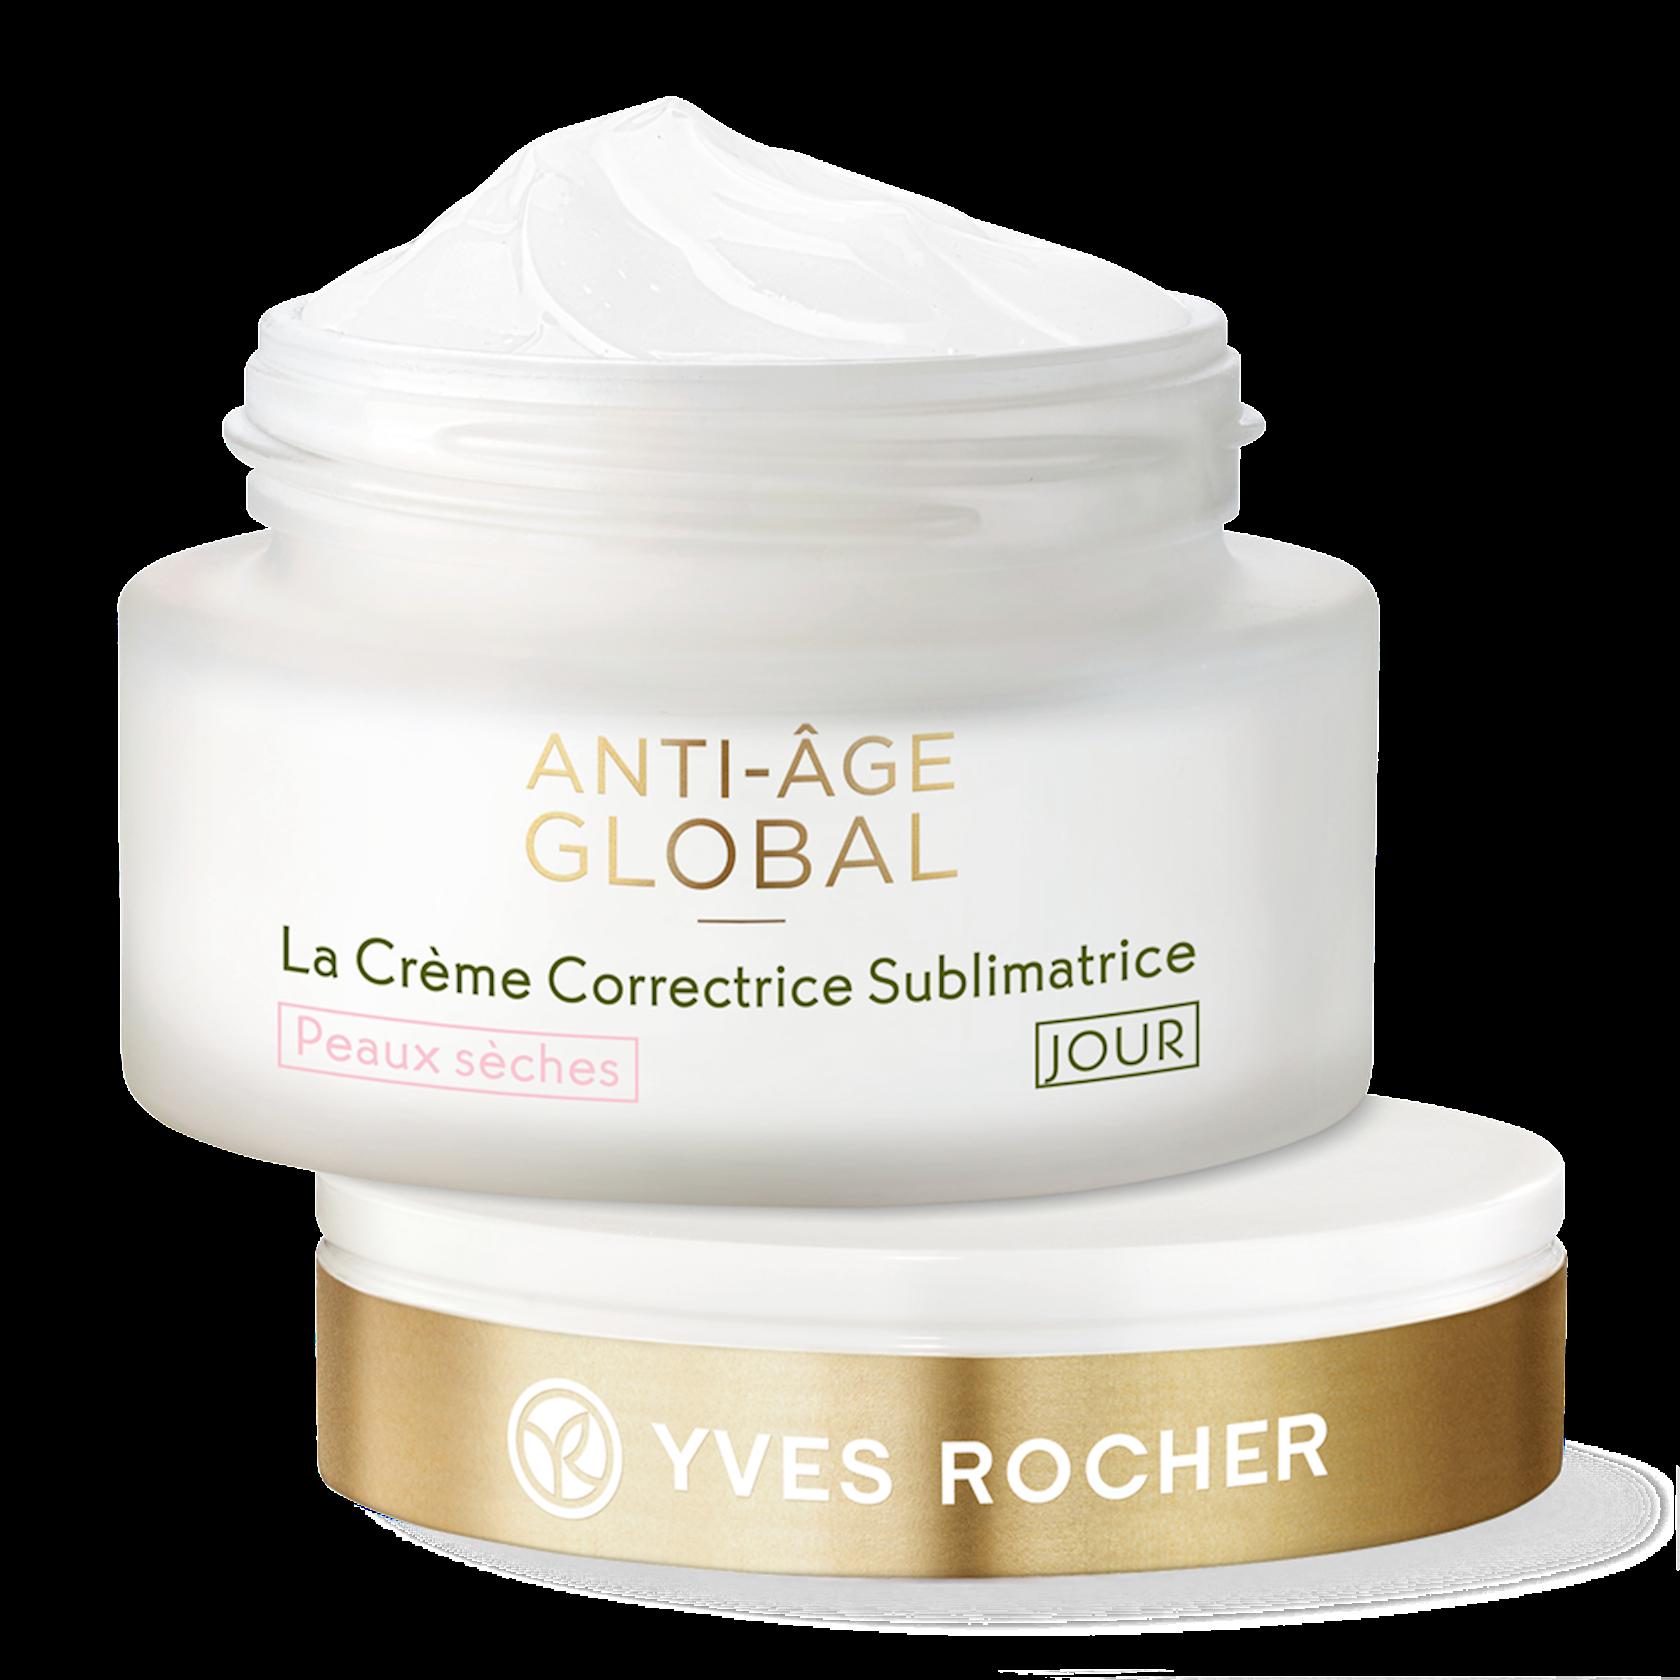 Gündüz üz kremi Yves Rocher The AntiAging Beautifying Cream Day Dry Skin 50 ml